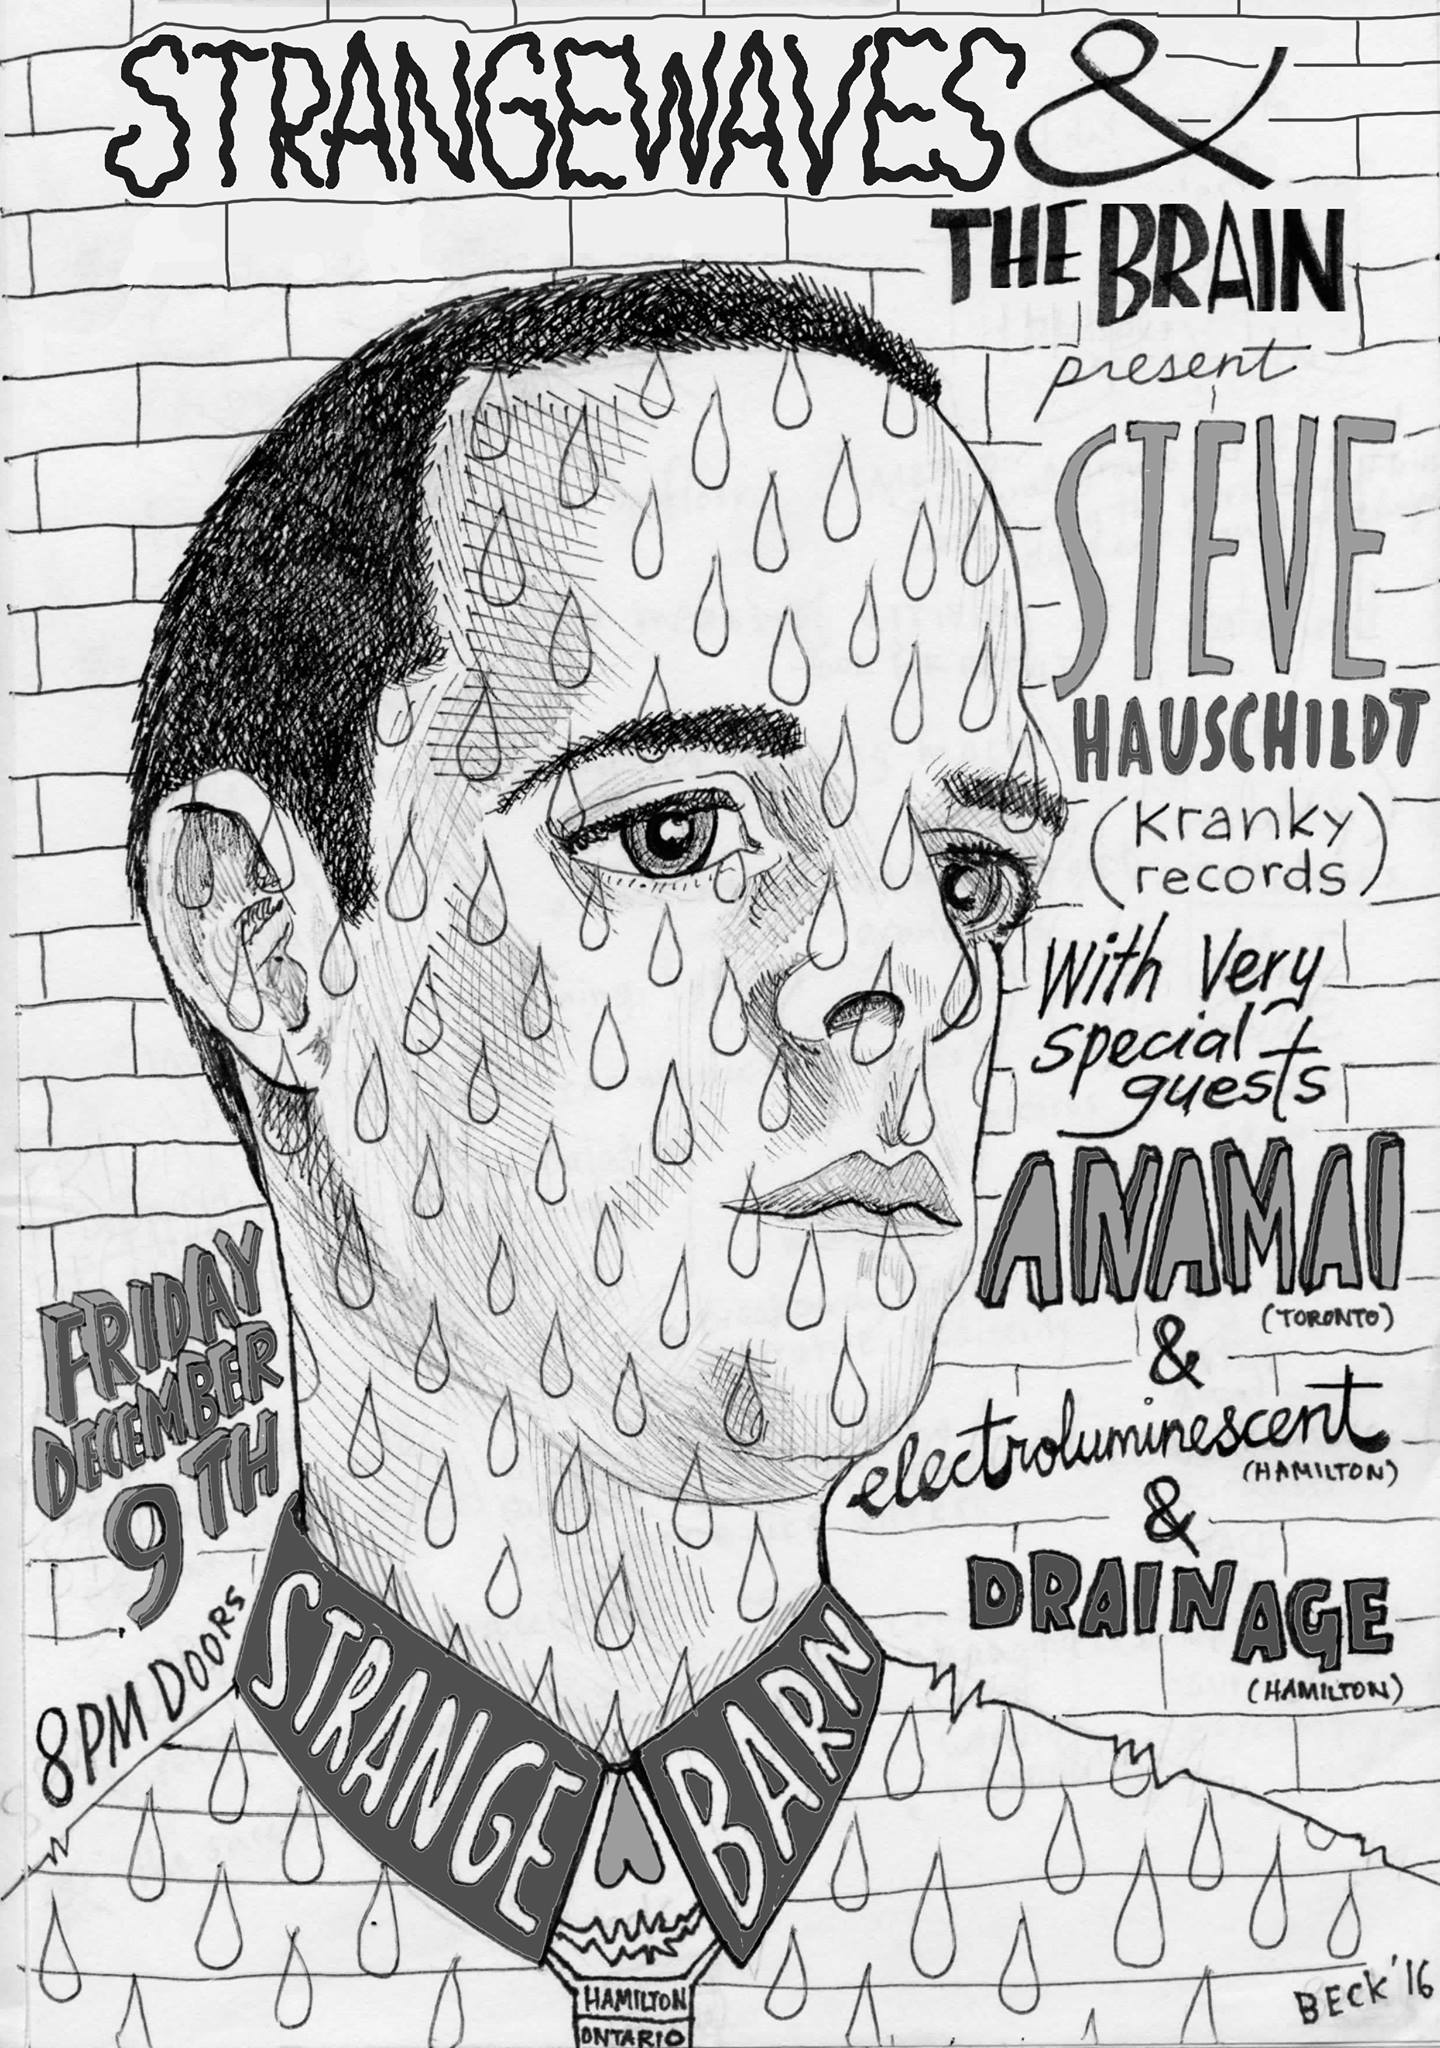 Steve Hauschildt (Kranky), Anamai, Electroluminescent, Drain Age  @Strangebarn